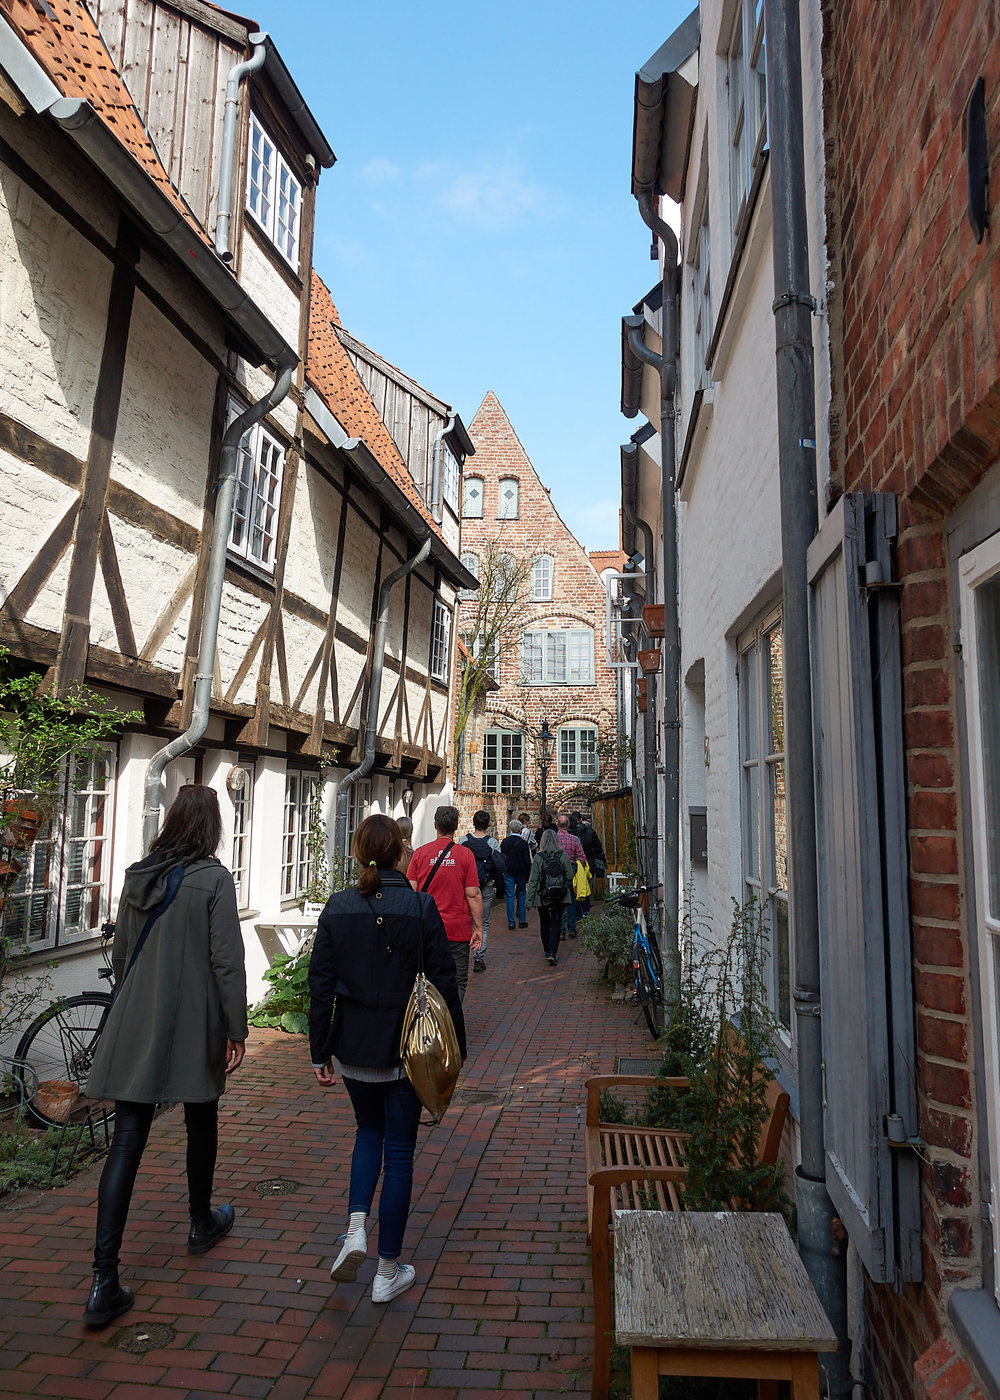 20190330-Lübeck-325.jpg